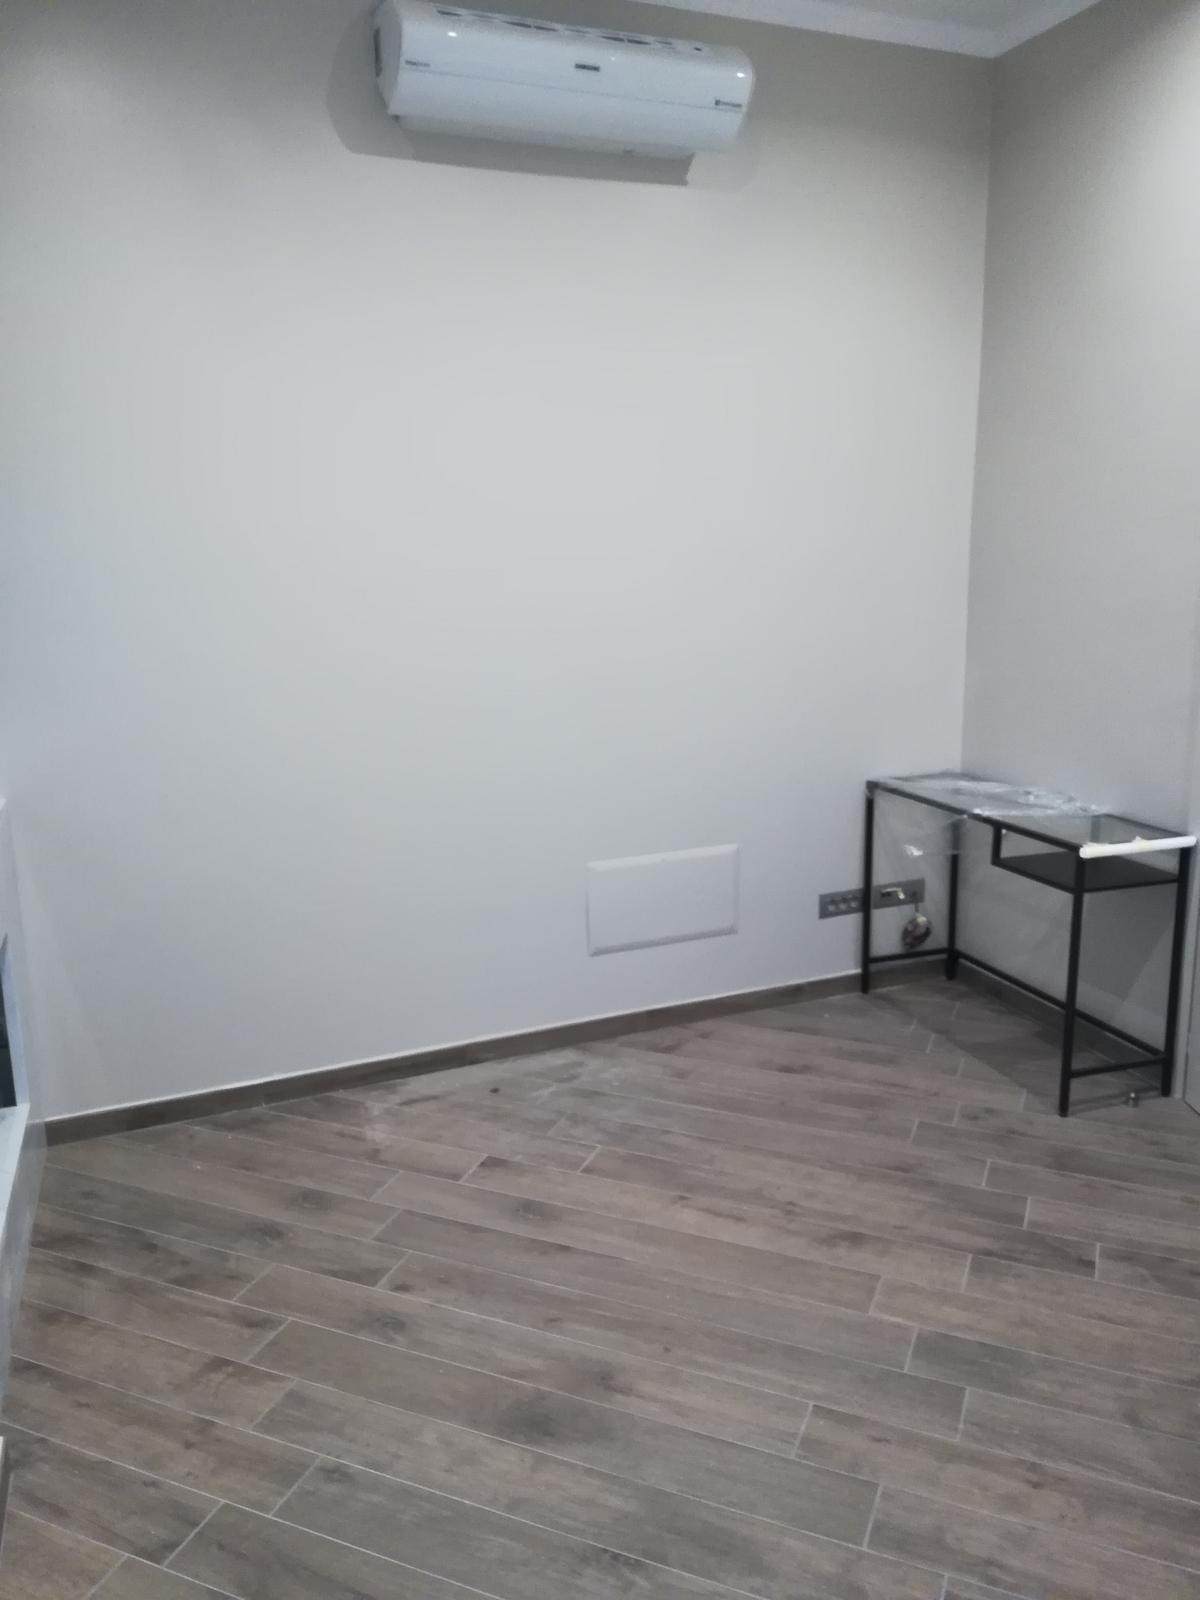 vente monaco rocher 2 pi ces r nov monaco monte carlo. Black Bedroom Furniture Sets. Home Design Ideas